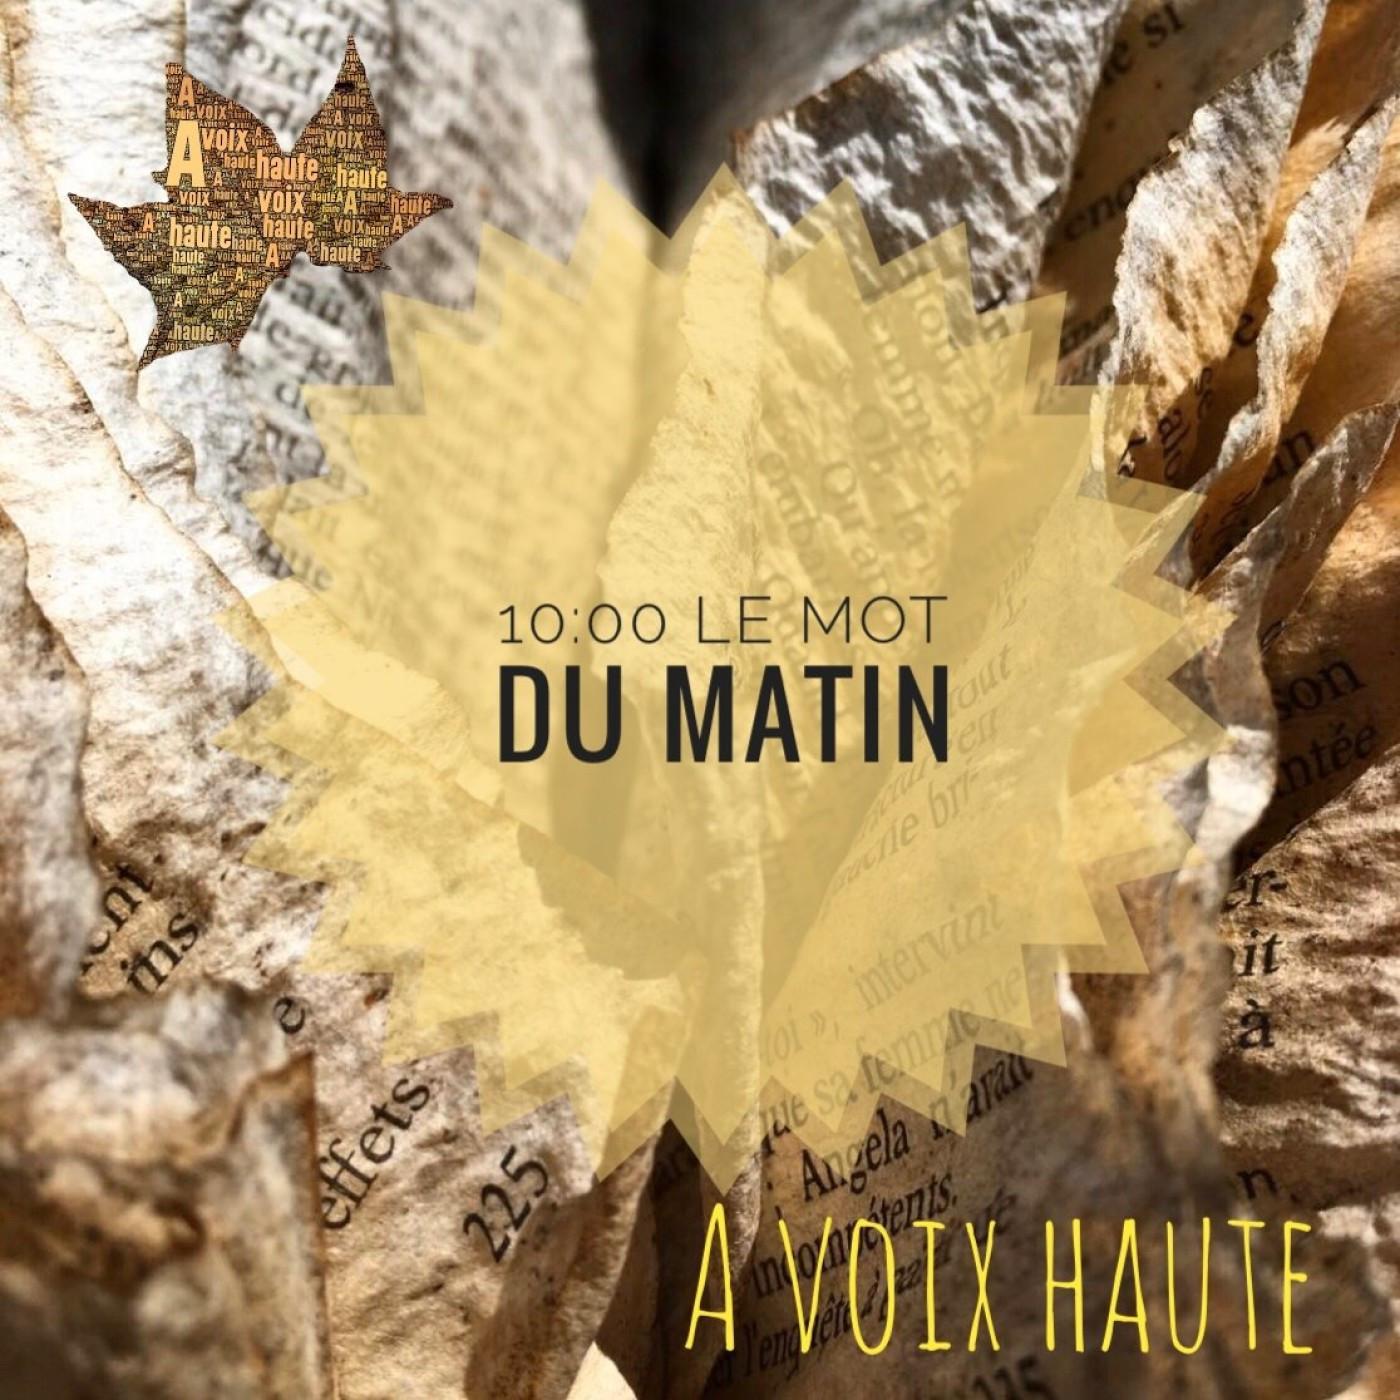 30 - LE MOT DU MATIN - Jean de La fontaine - Yannick Debain